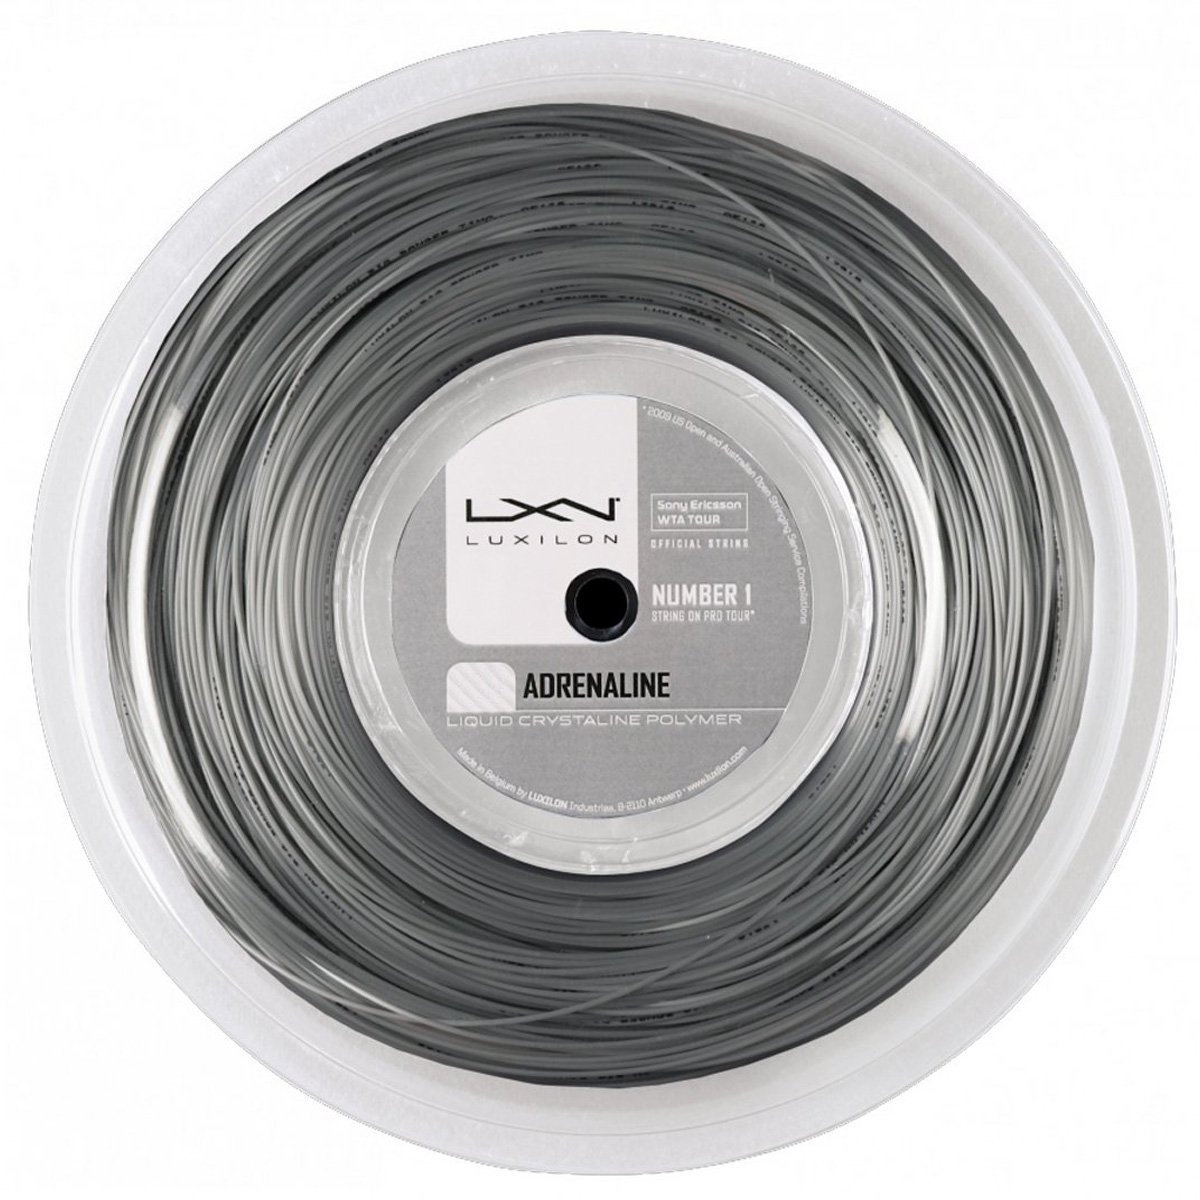 Corda de Tenis Luxilon Adrenaline 1.30 MM Rolo com 200M